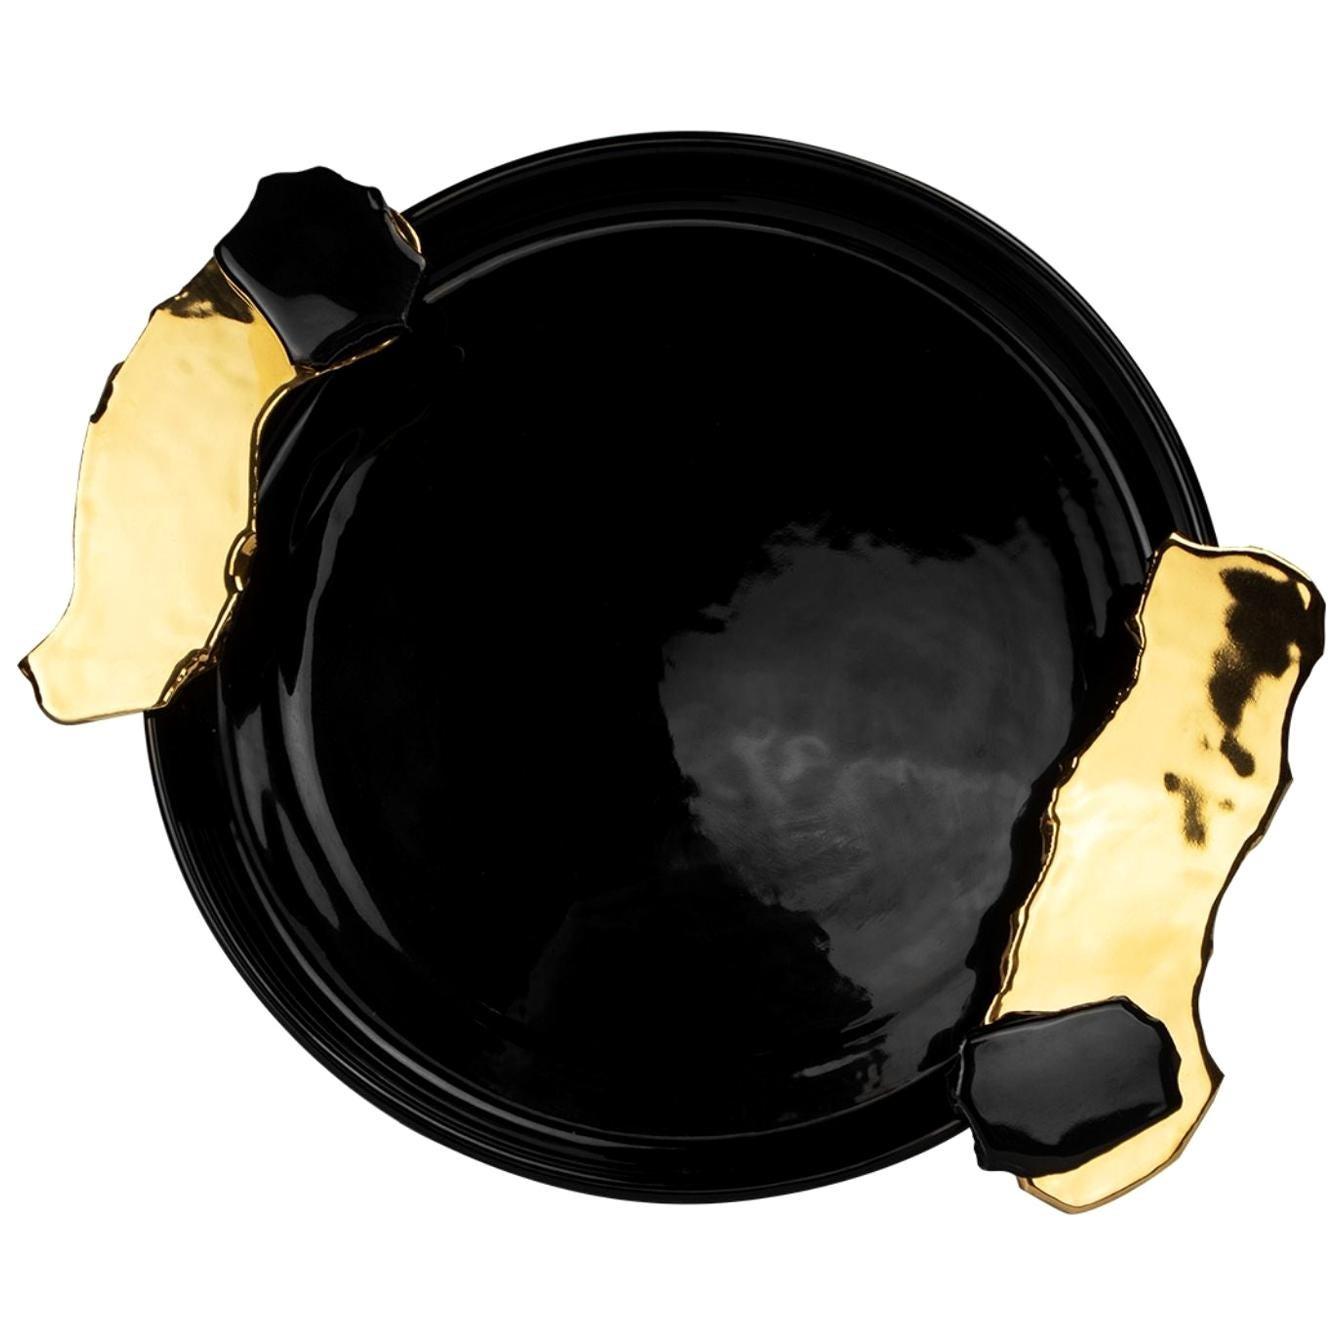 Black & Gold Round Tray with Handles, Hand-Painted Ceramic, Modern Bauhaus